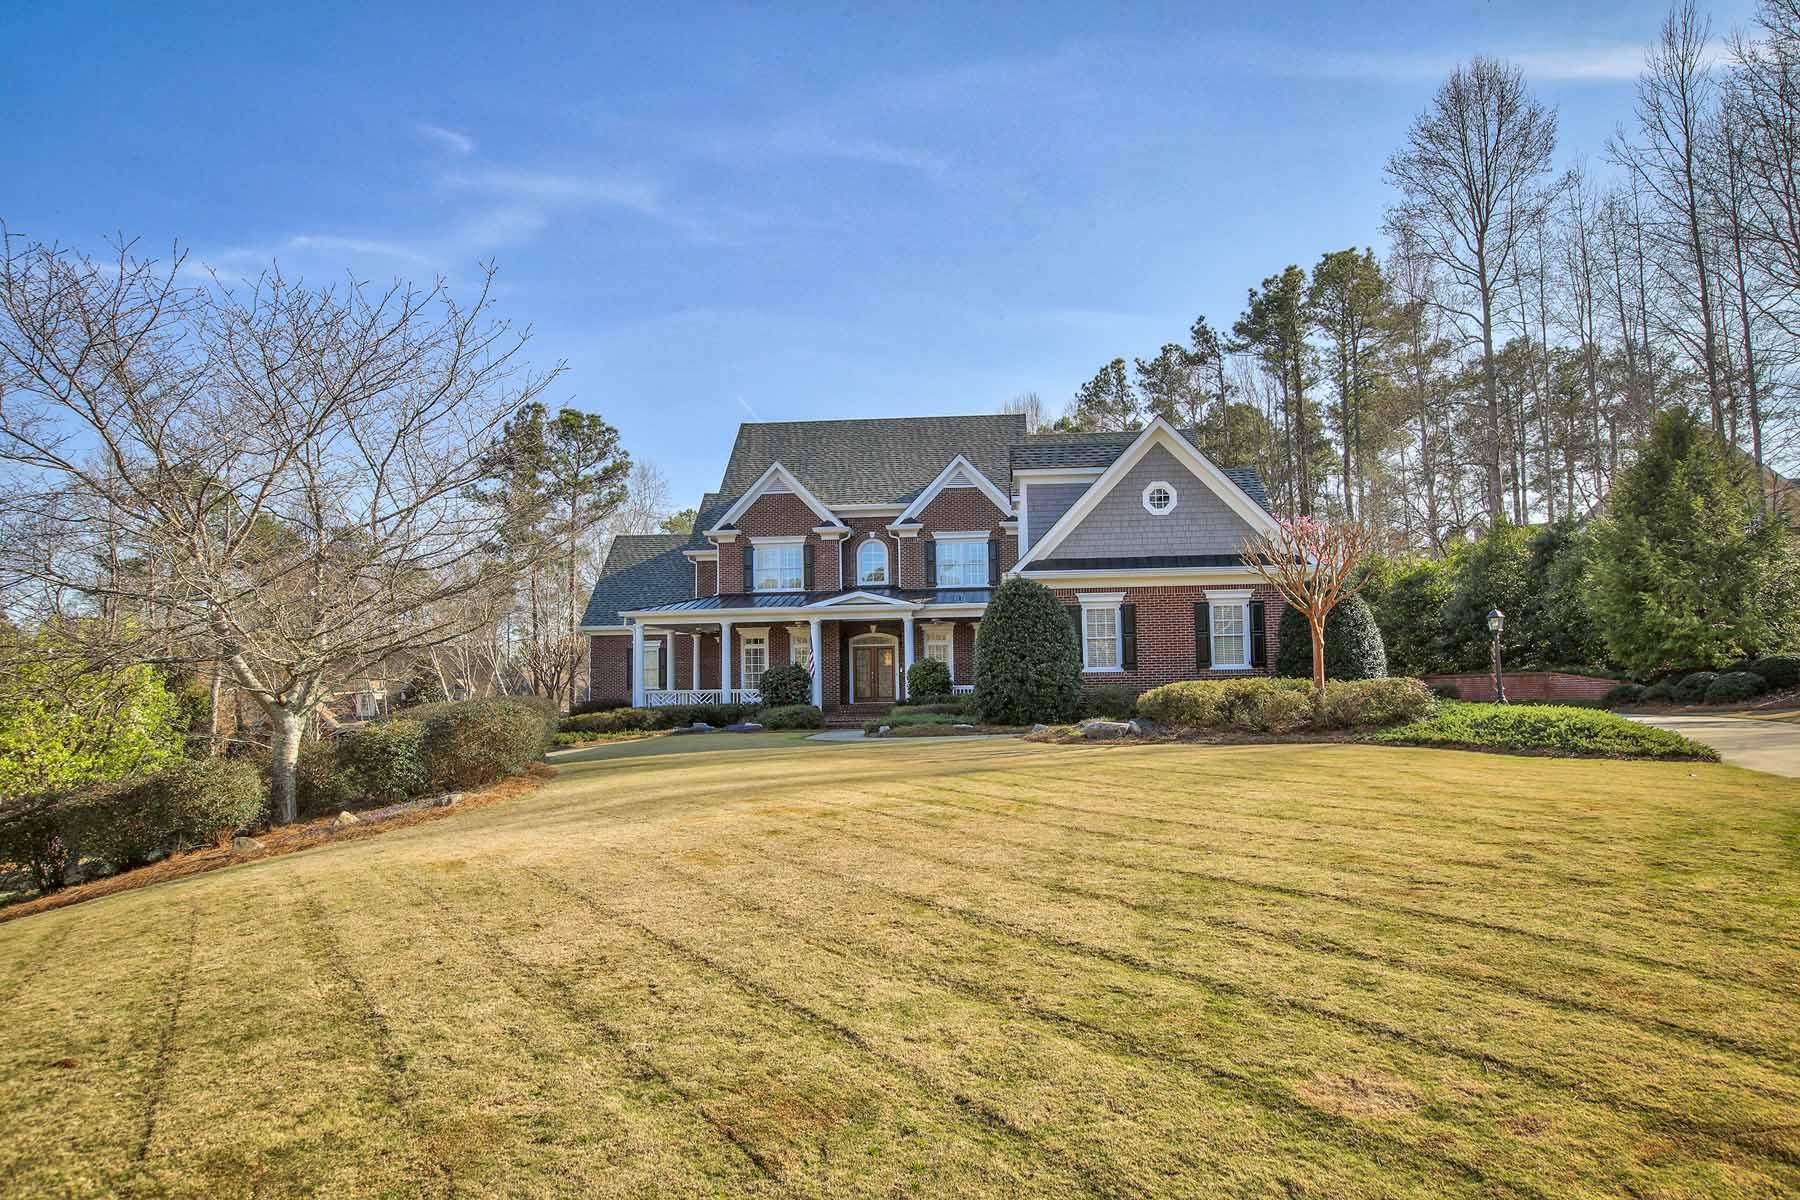 Single Family Home for Sale at Impeccable All Brick Estate Home 700 Lake Mist Cove Alpharetta, Georgia, 30004 United States